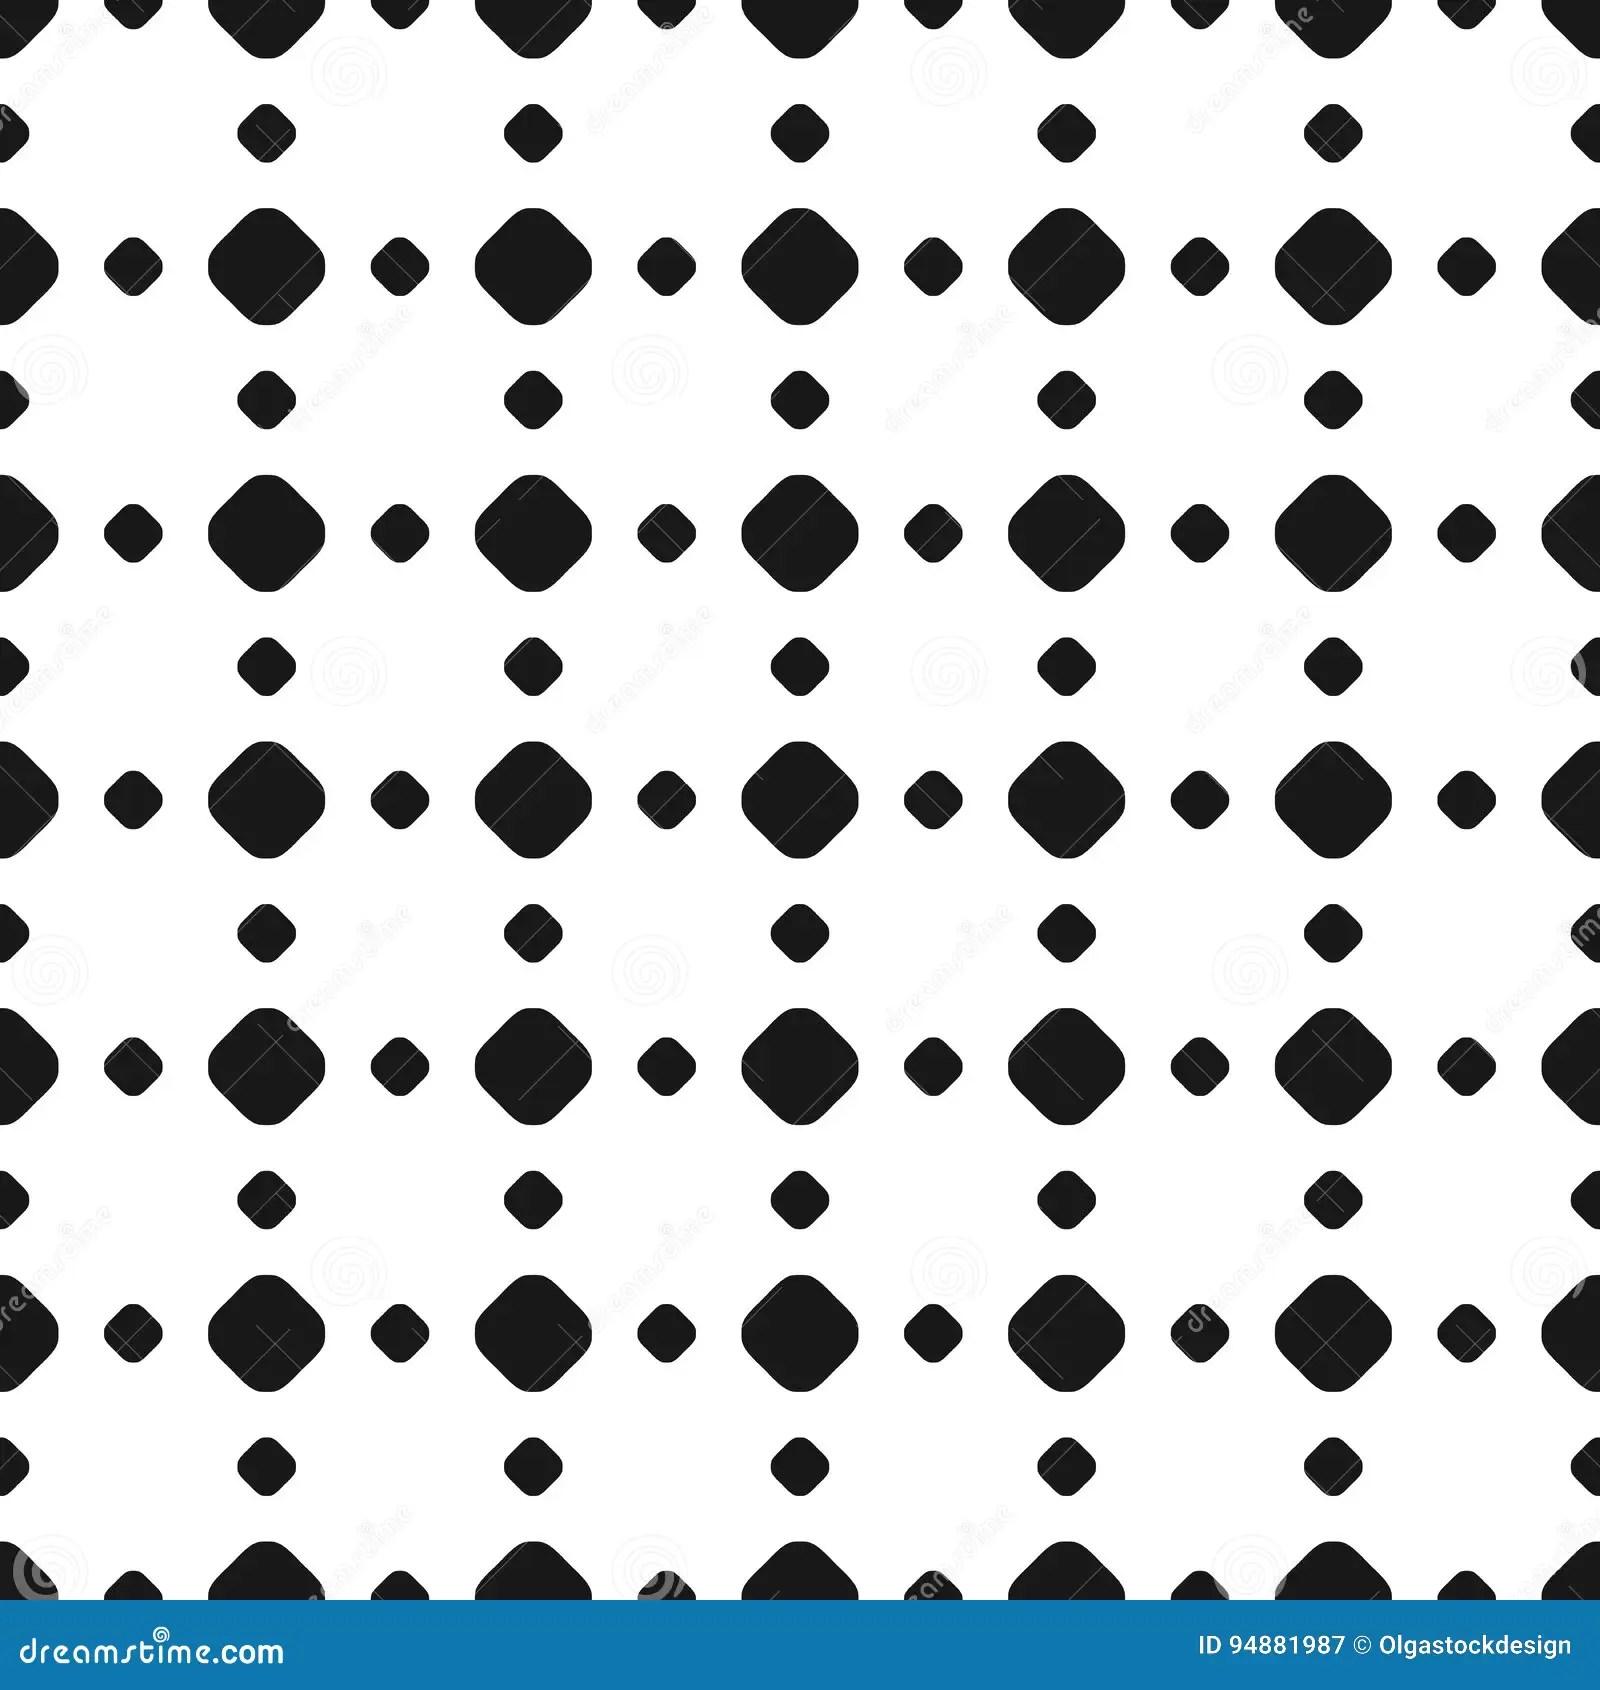 Polka Dot Seamless Pattern Vector Black Amp White Subtle